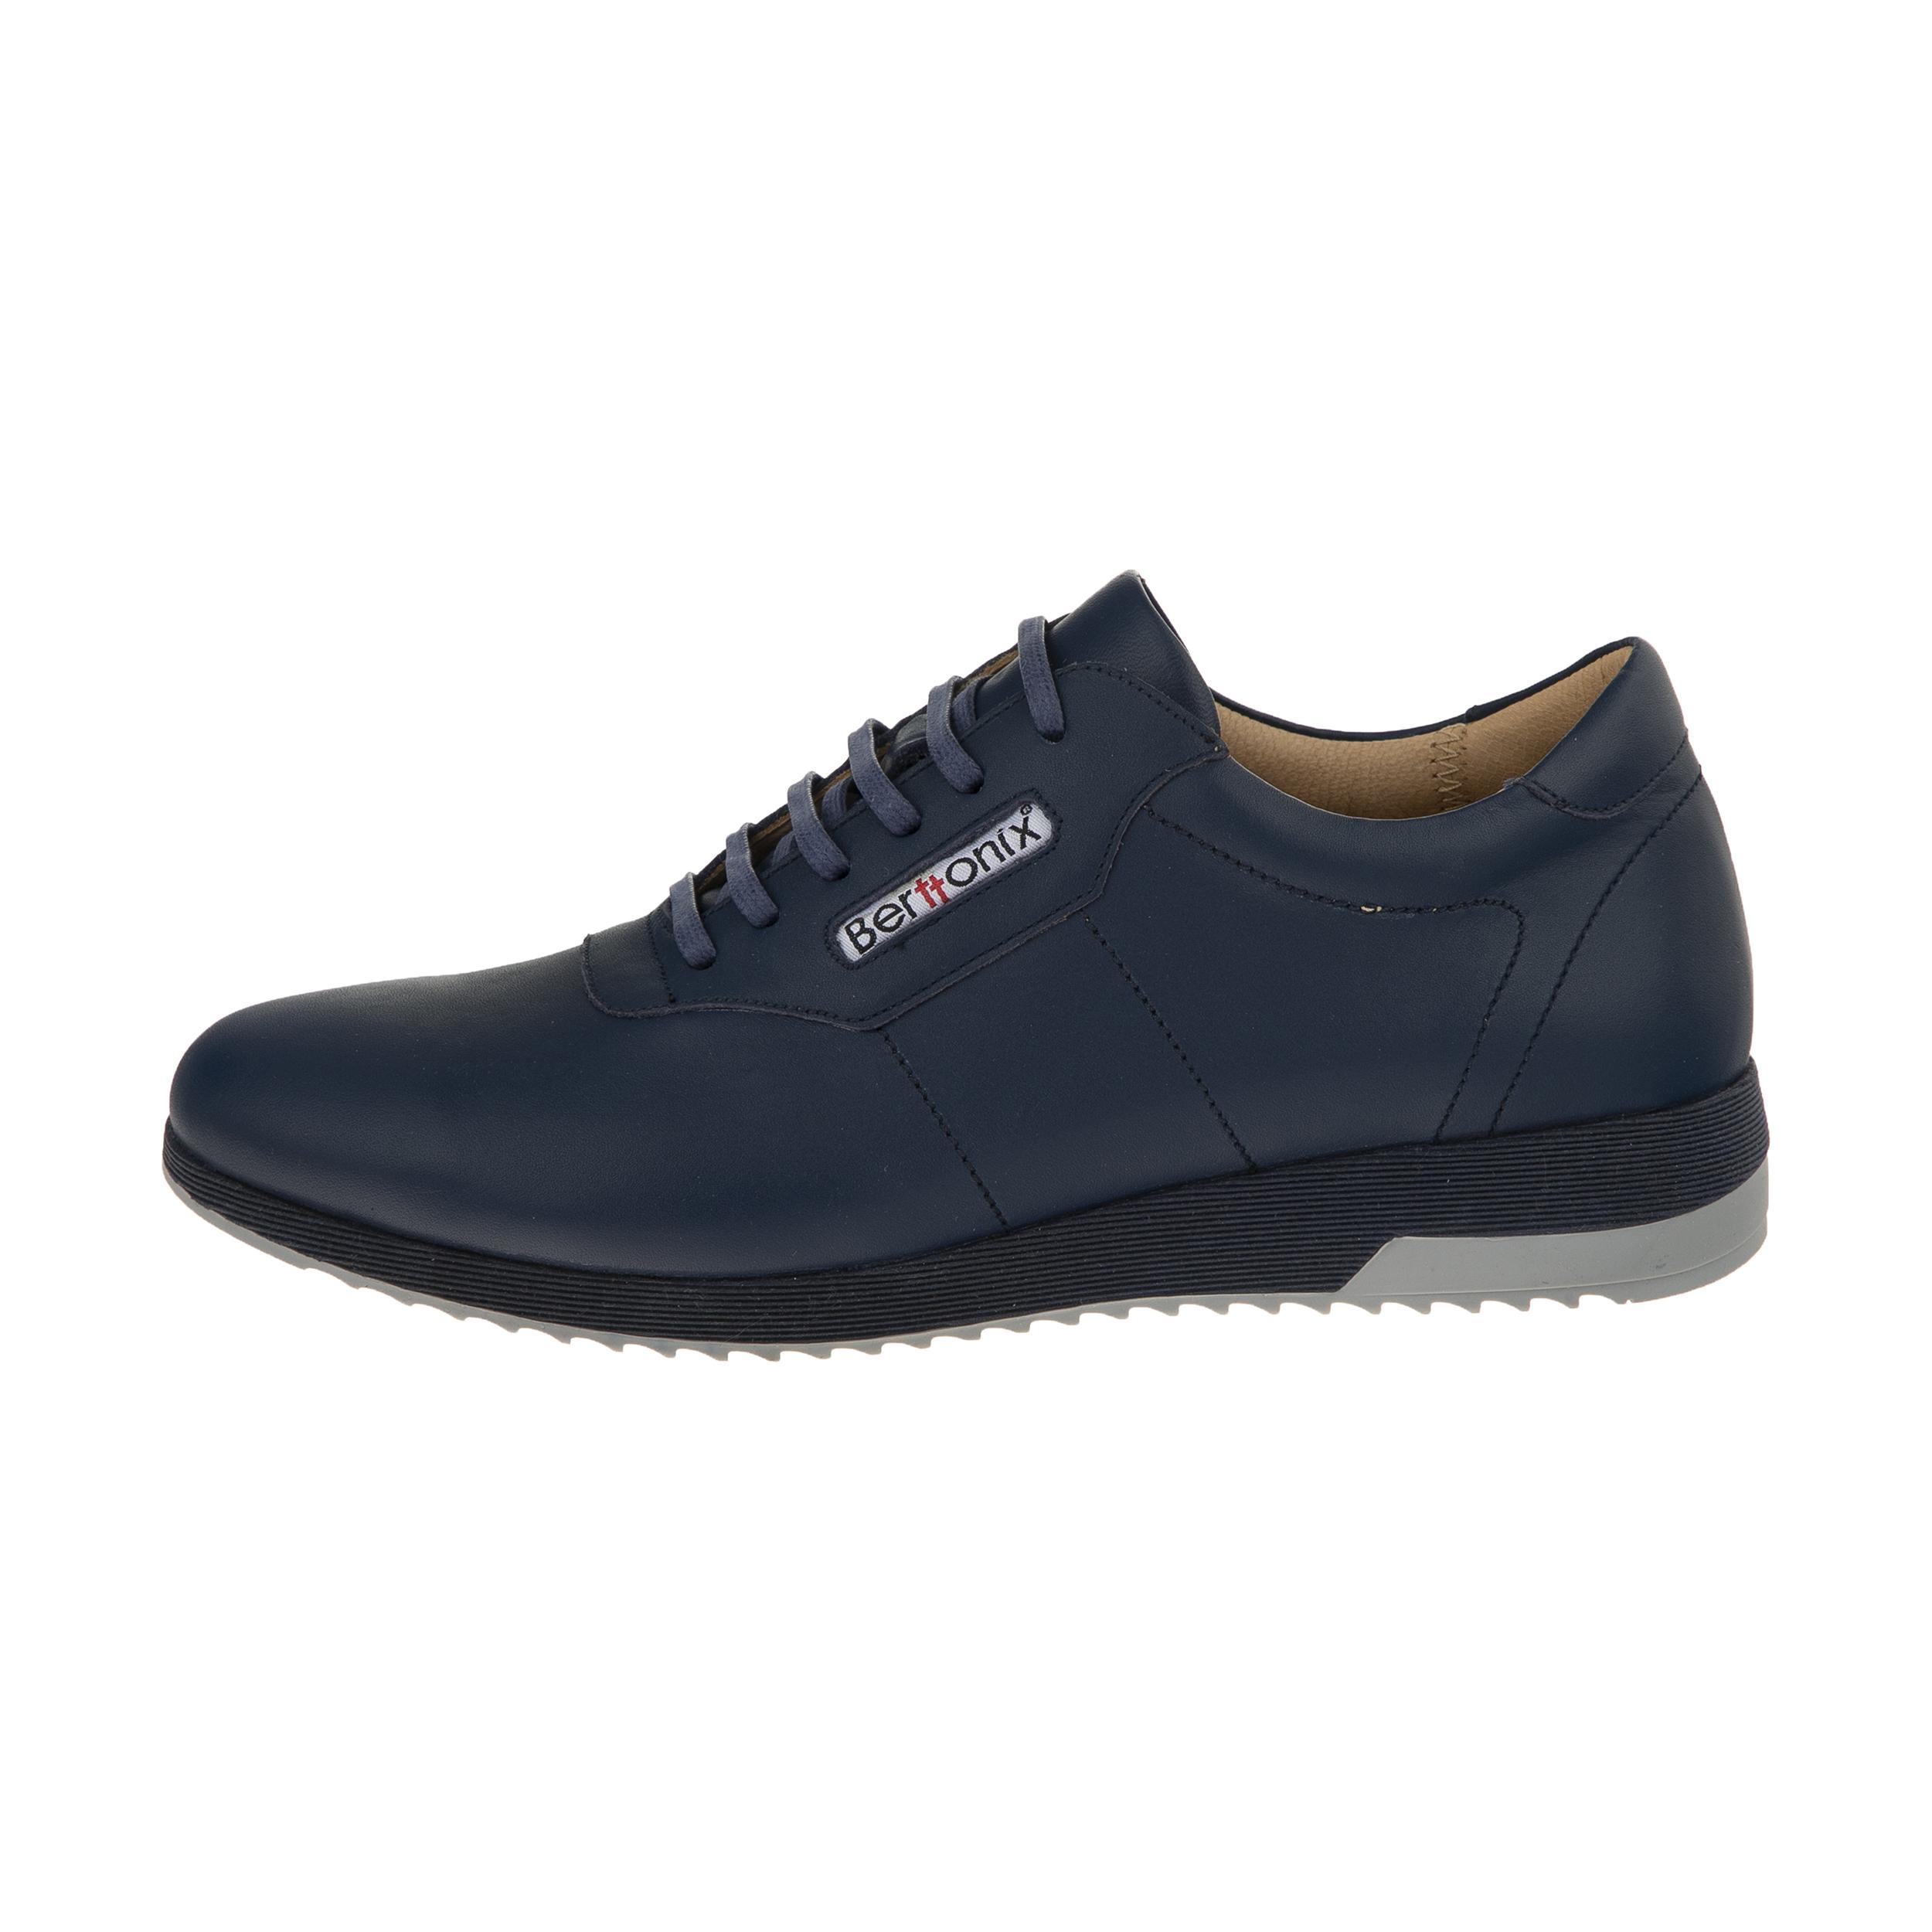 کفش روزمره زنانه برتونیکس مدل 730-16